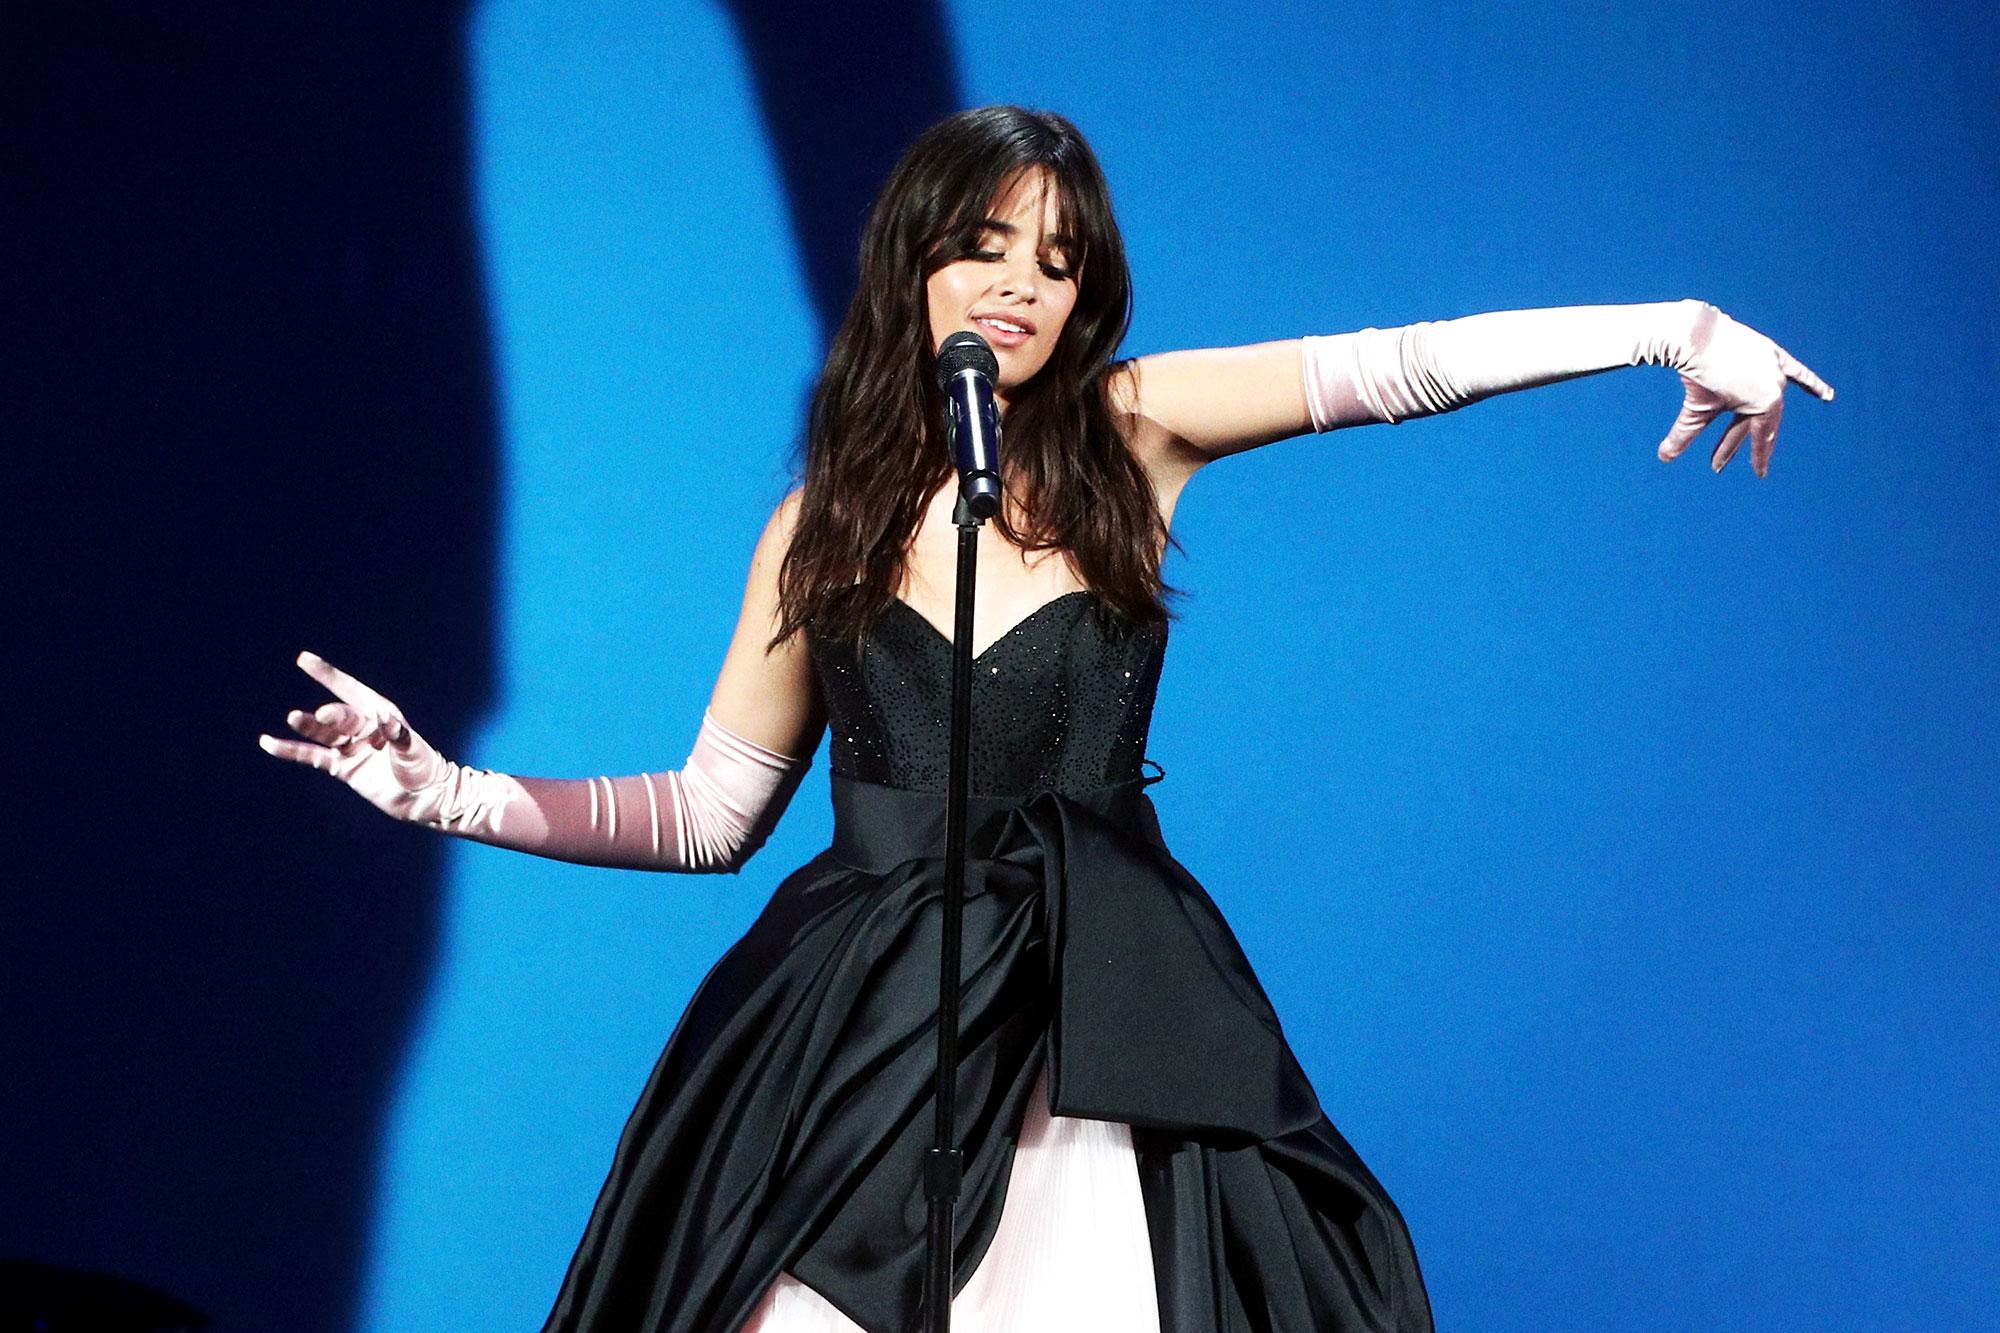 Amas 2018 Camila Cabello S Performance Drives Twitter Wild